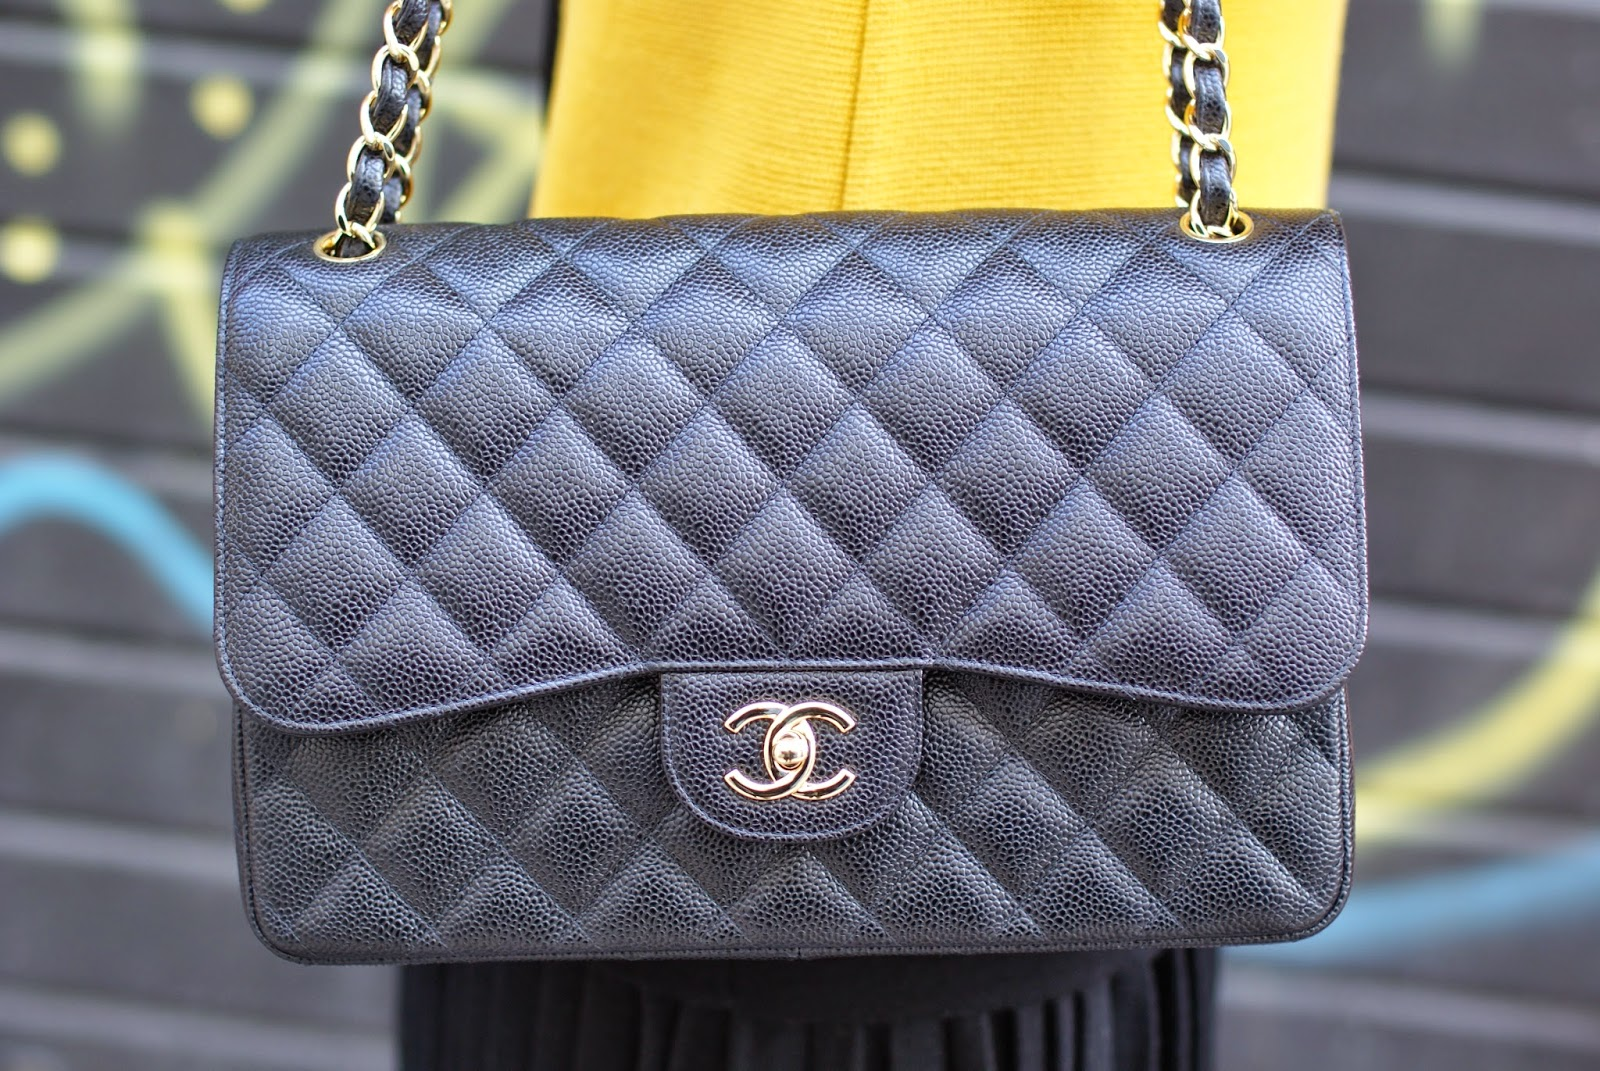 borsa chanel 2.55 pelle martellata, Chanel 2.55 classic flap, Fashion and Cookies fashion blog, fashion blogger